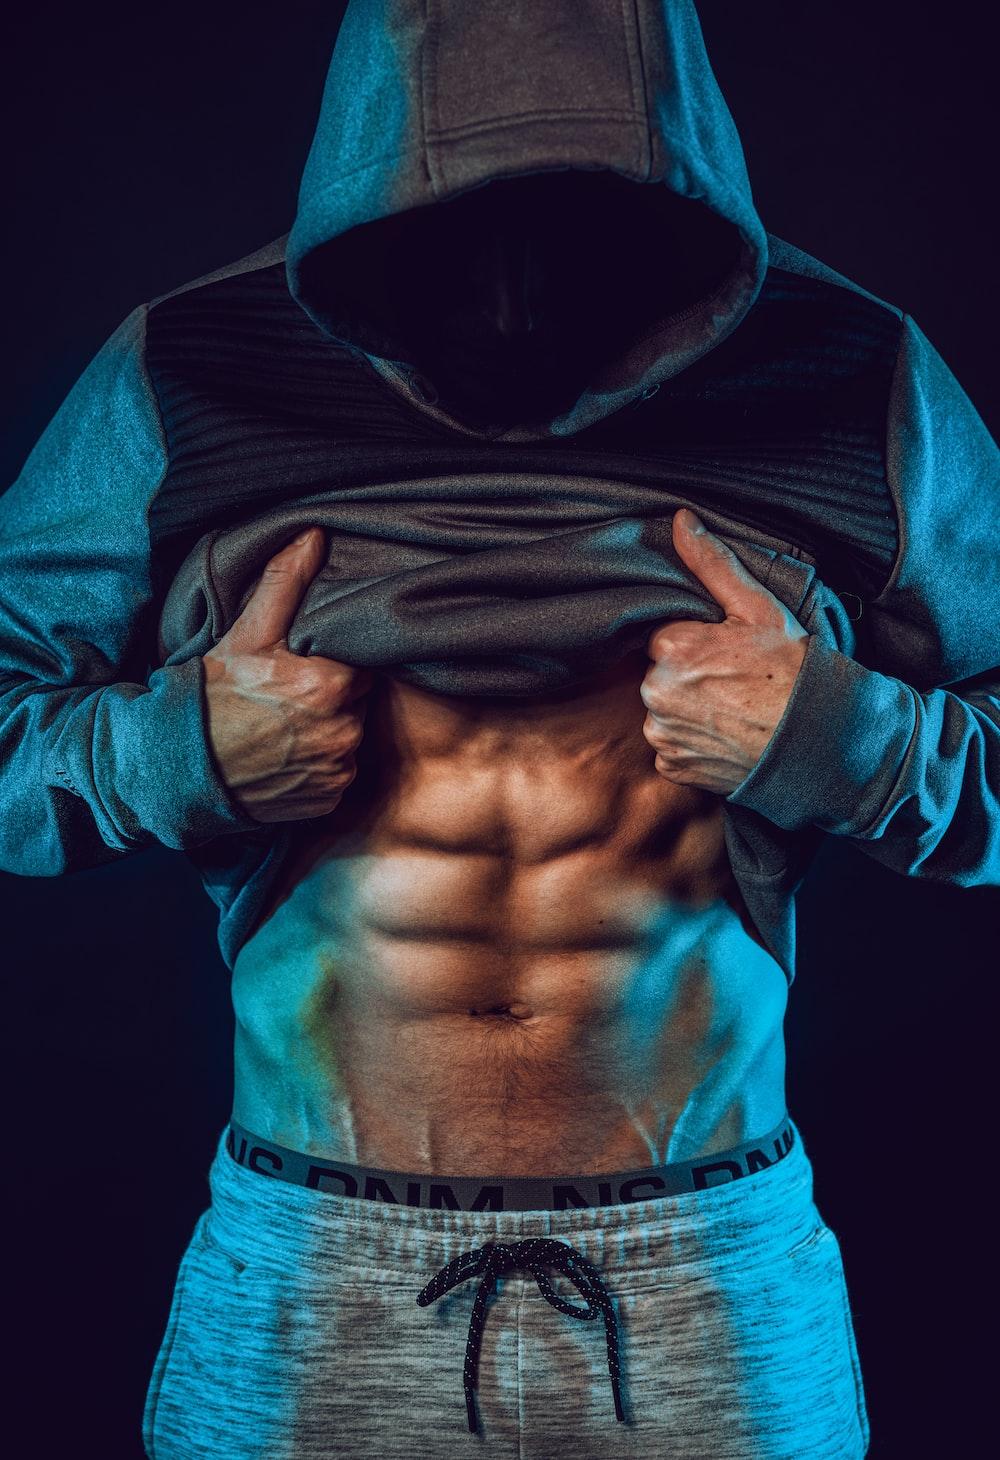 500 Bodybuilder Photos Hd Download Free Images On Unsplash